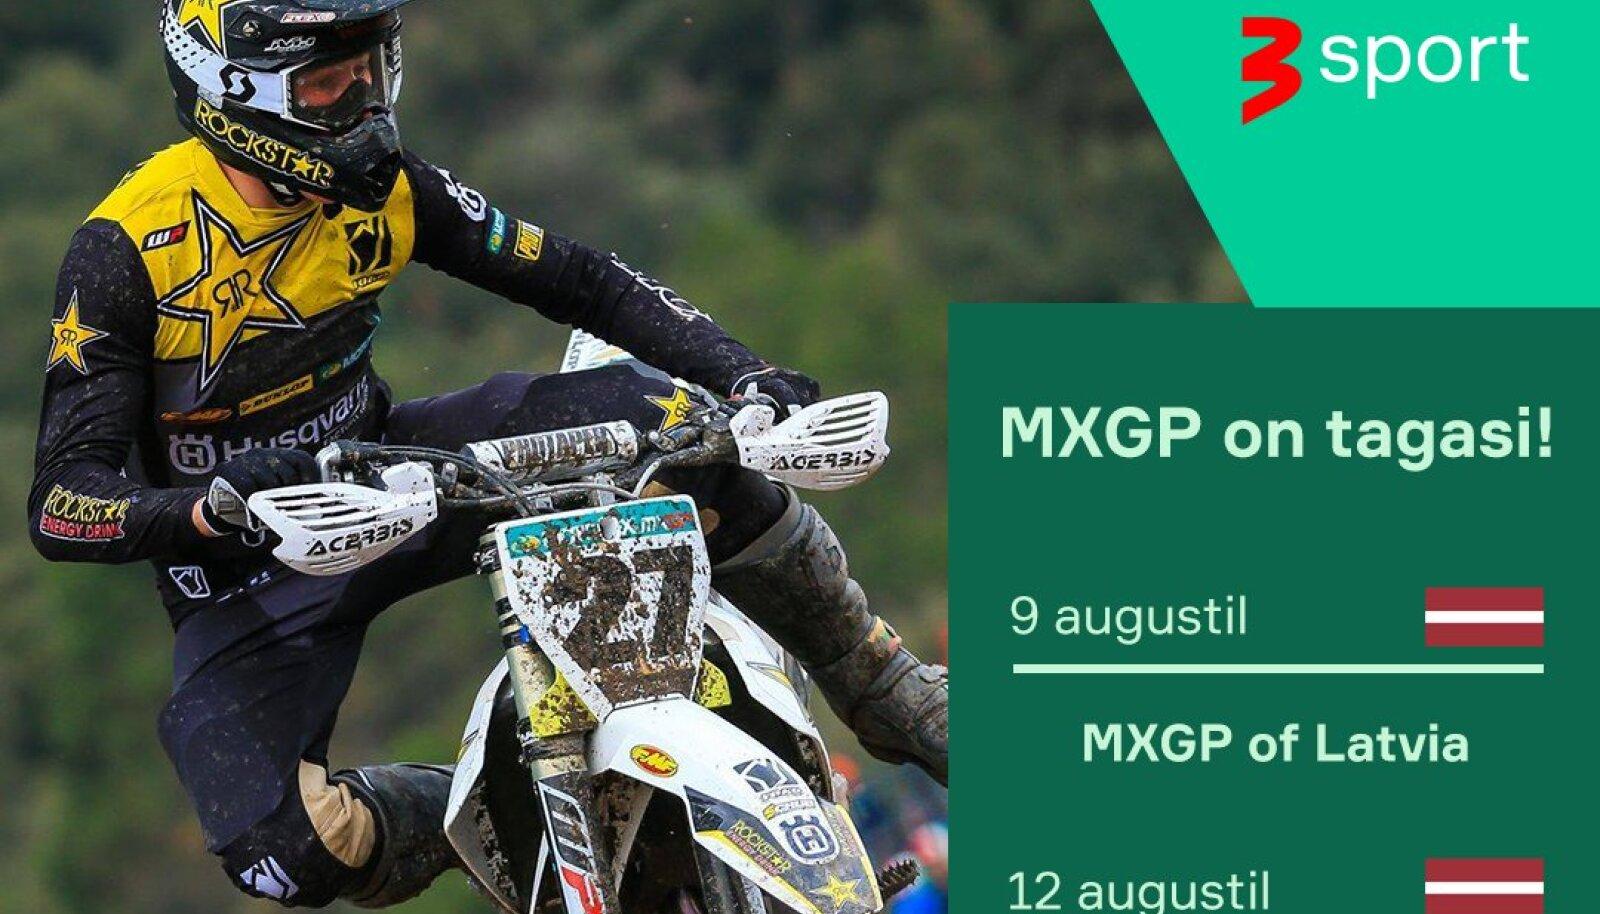 MXGP tuleb tagasi